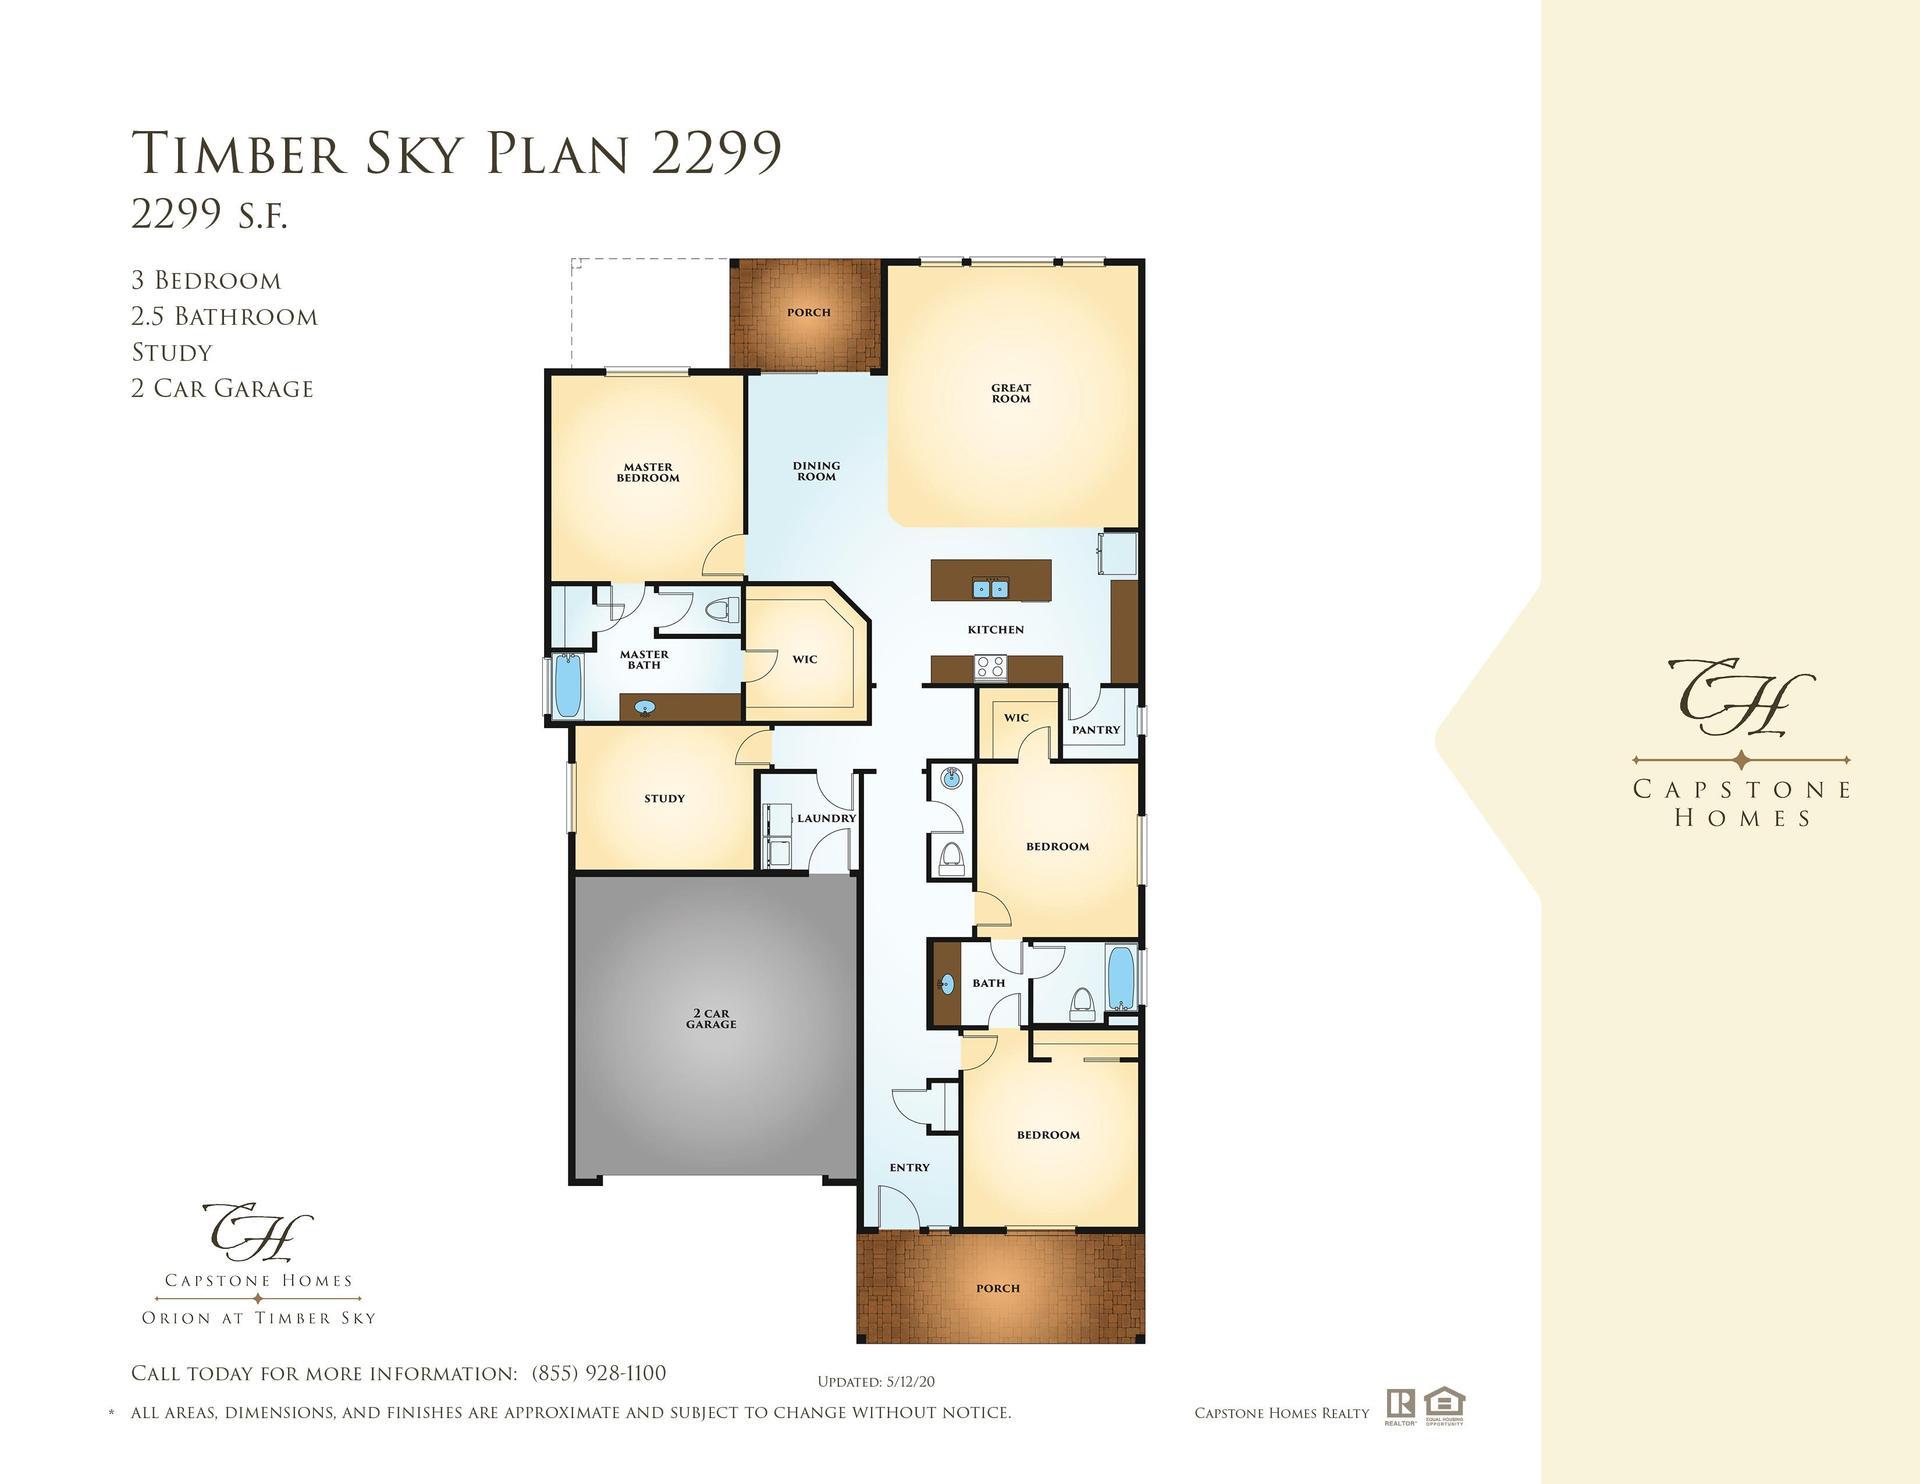 Timber Sky Plan 2299 Plan